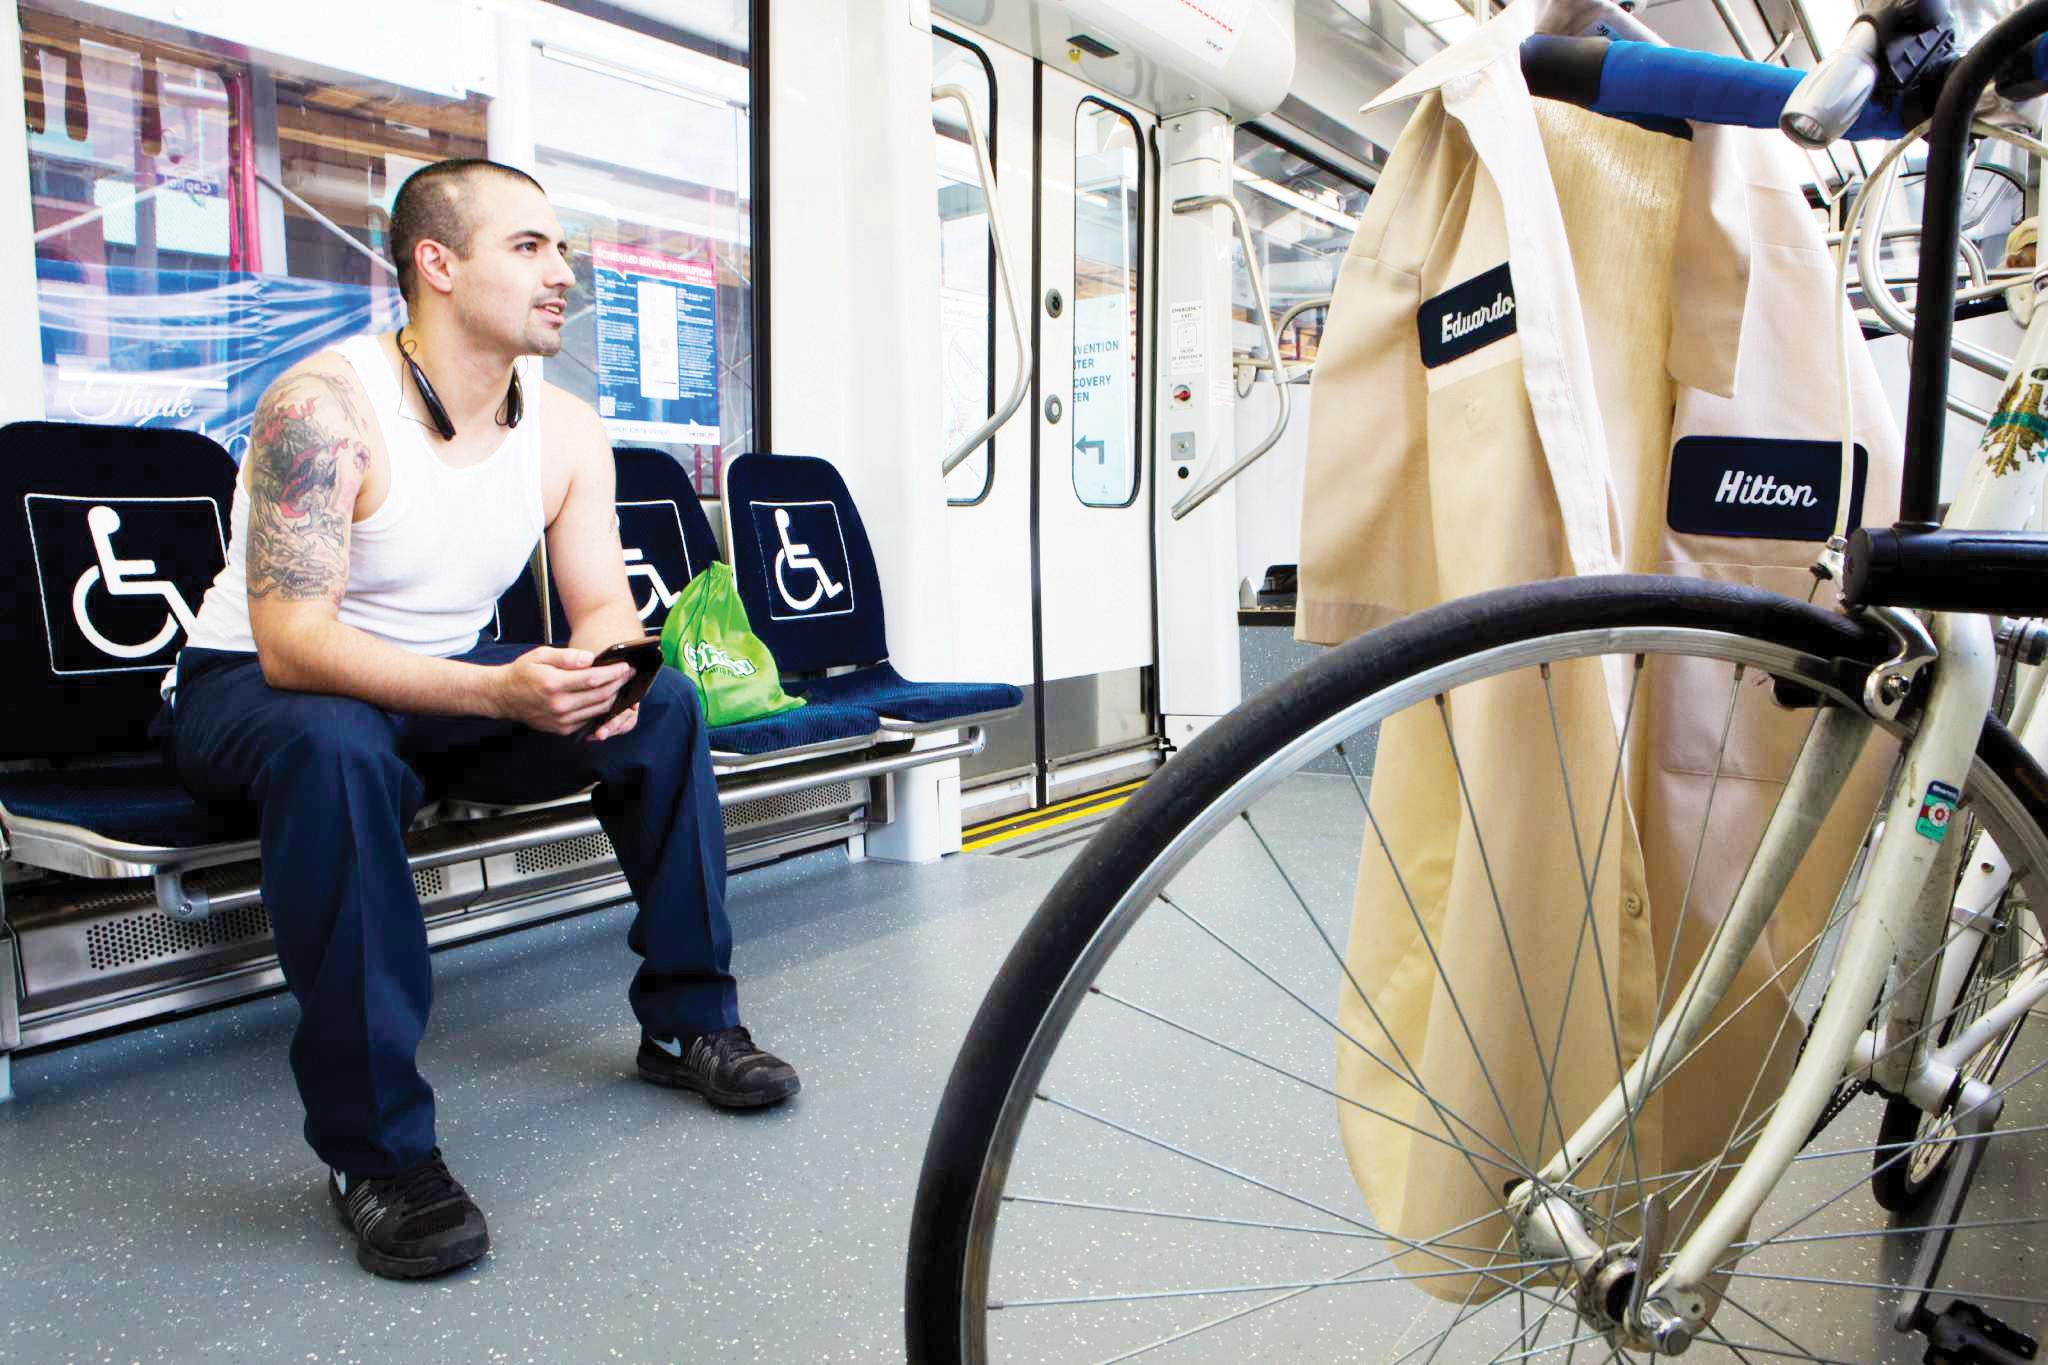 Metro aceptará bicicletas durante horas pico